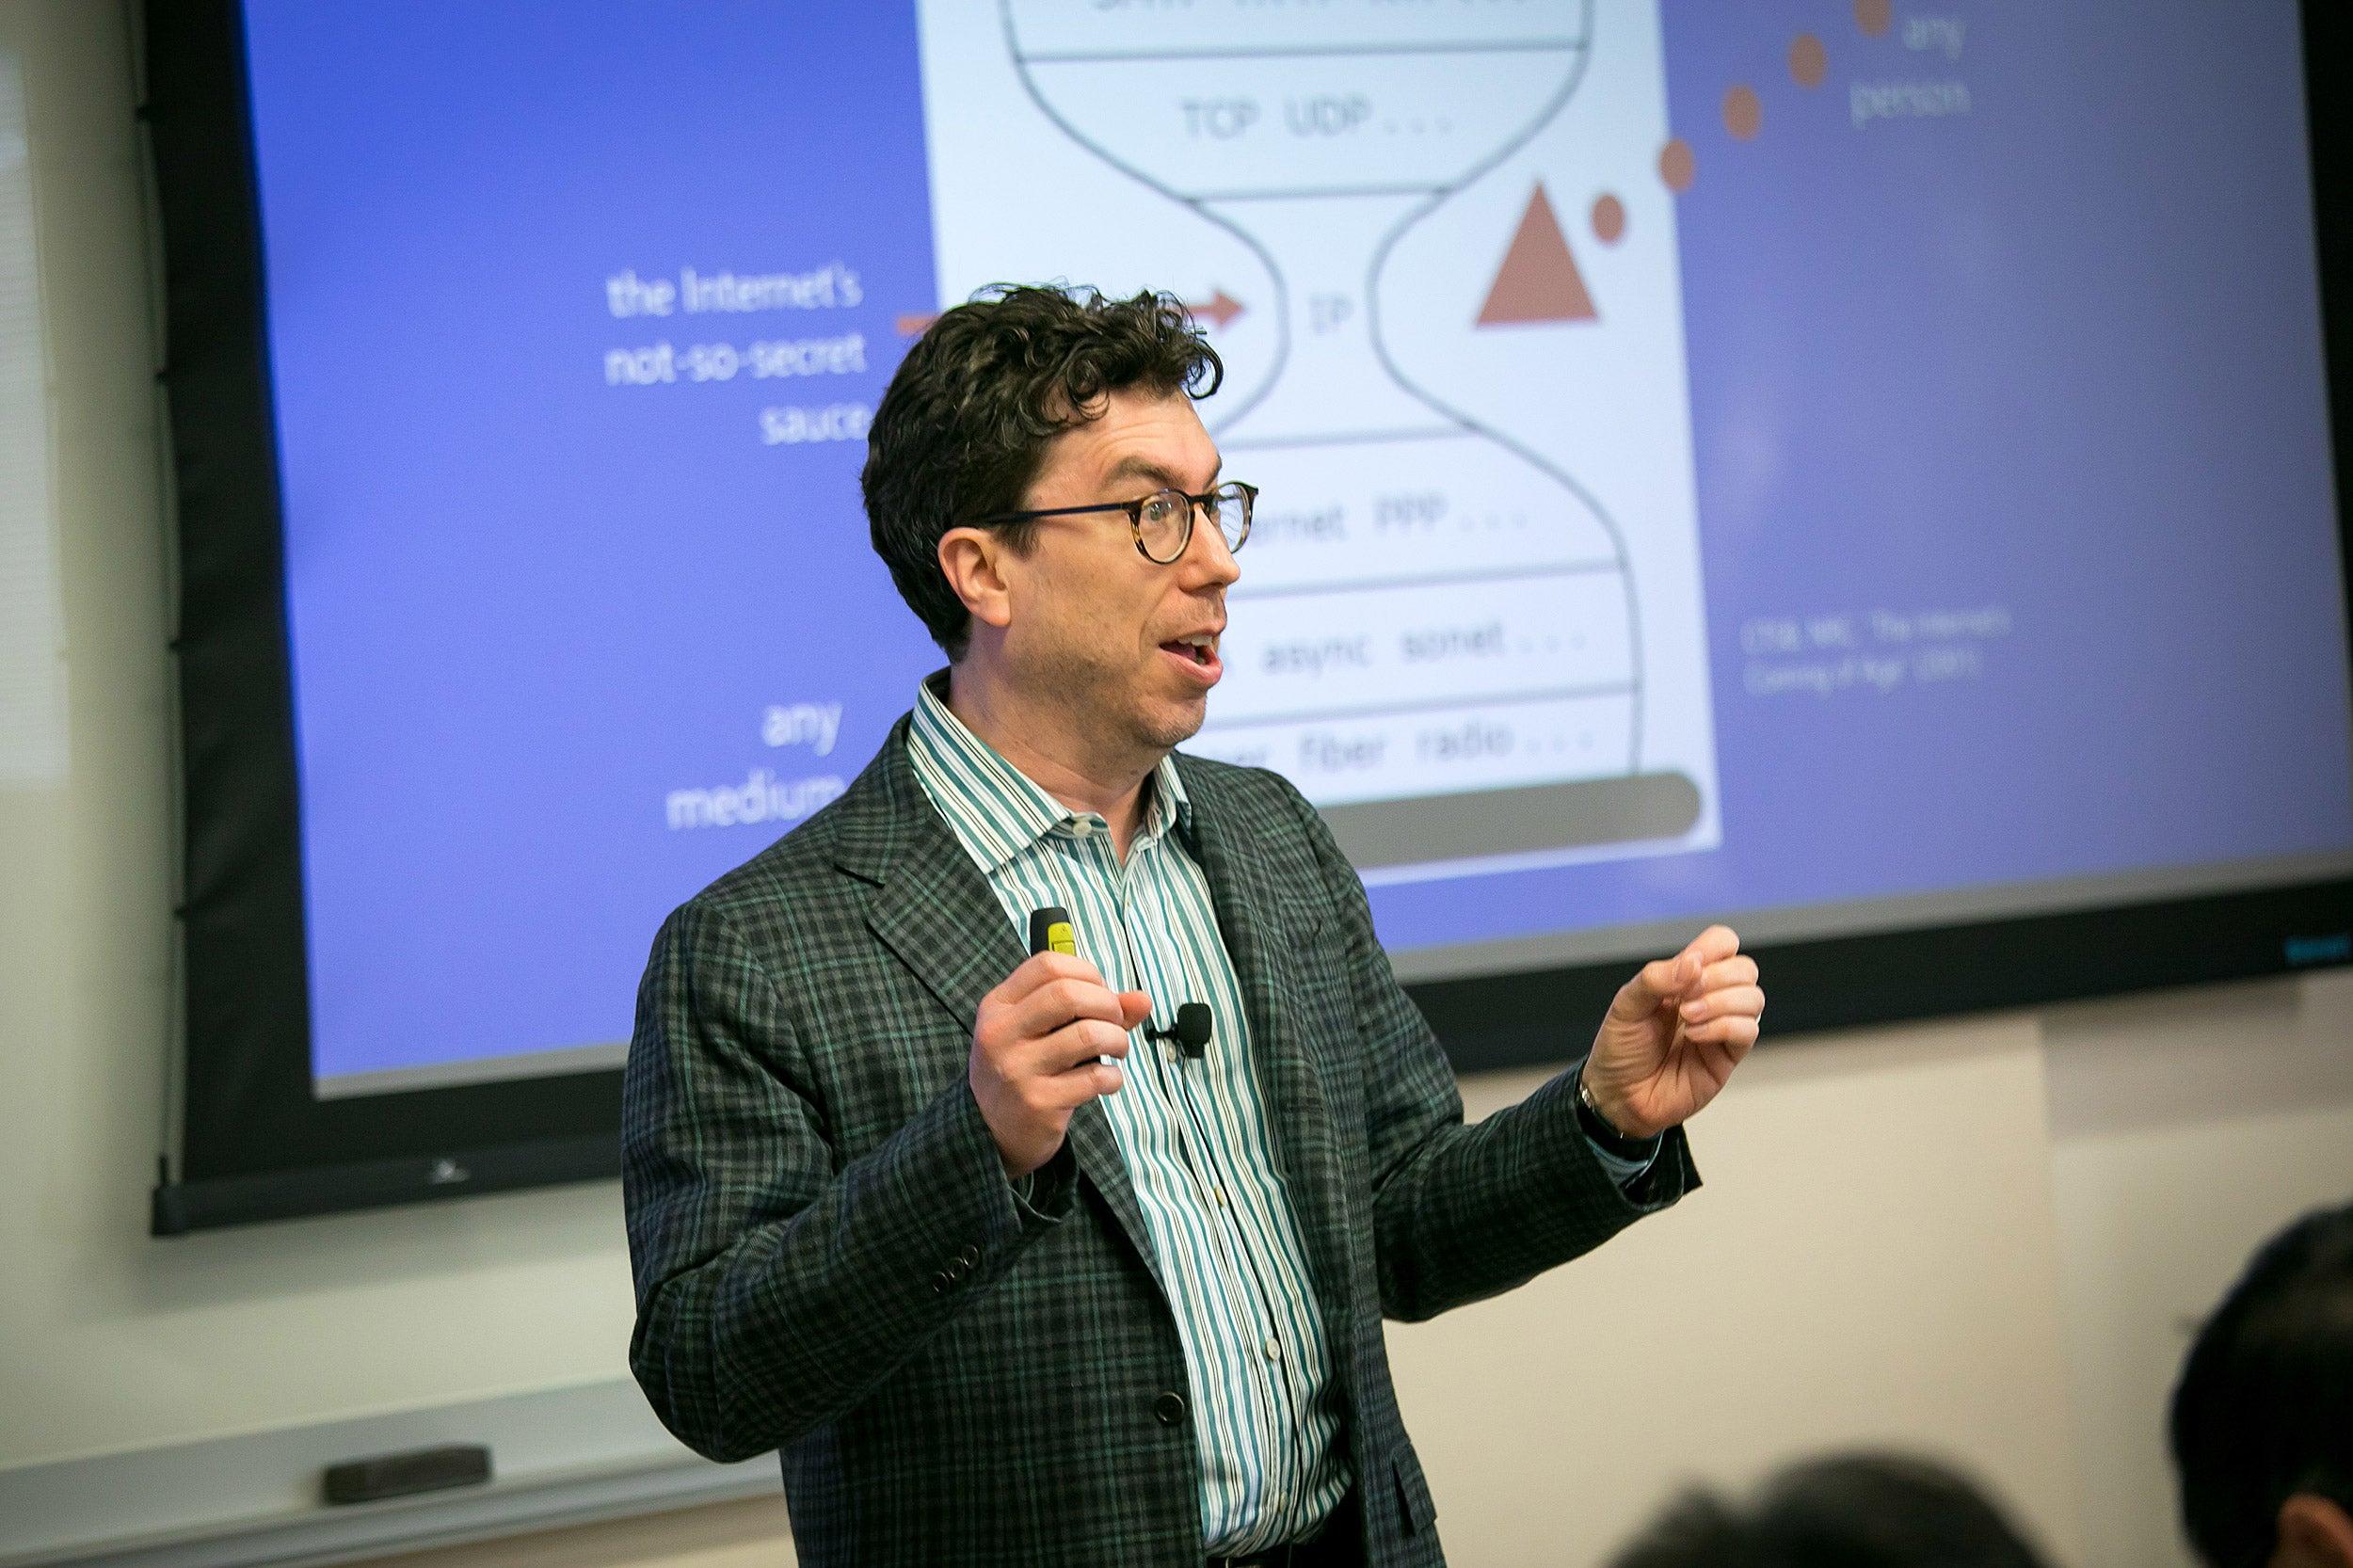 Jonathan Zittrain giving a presentation